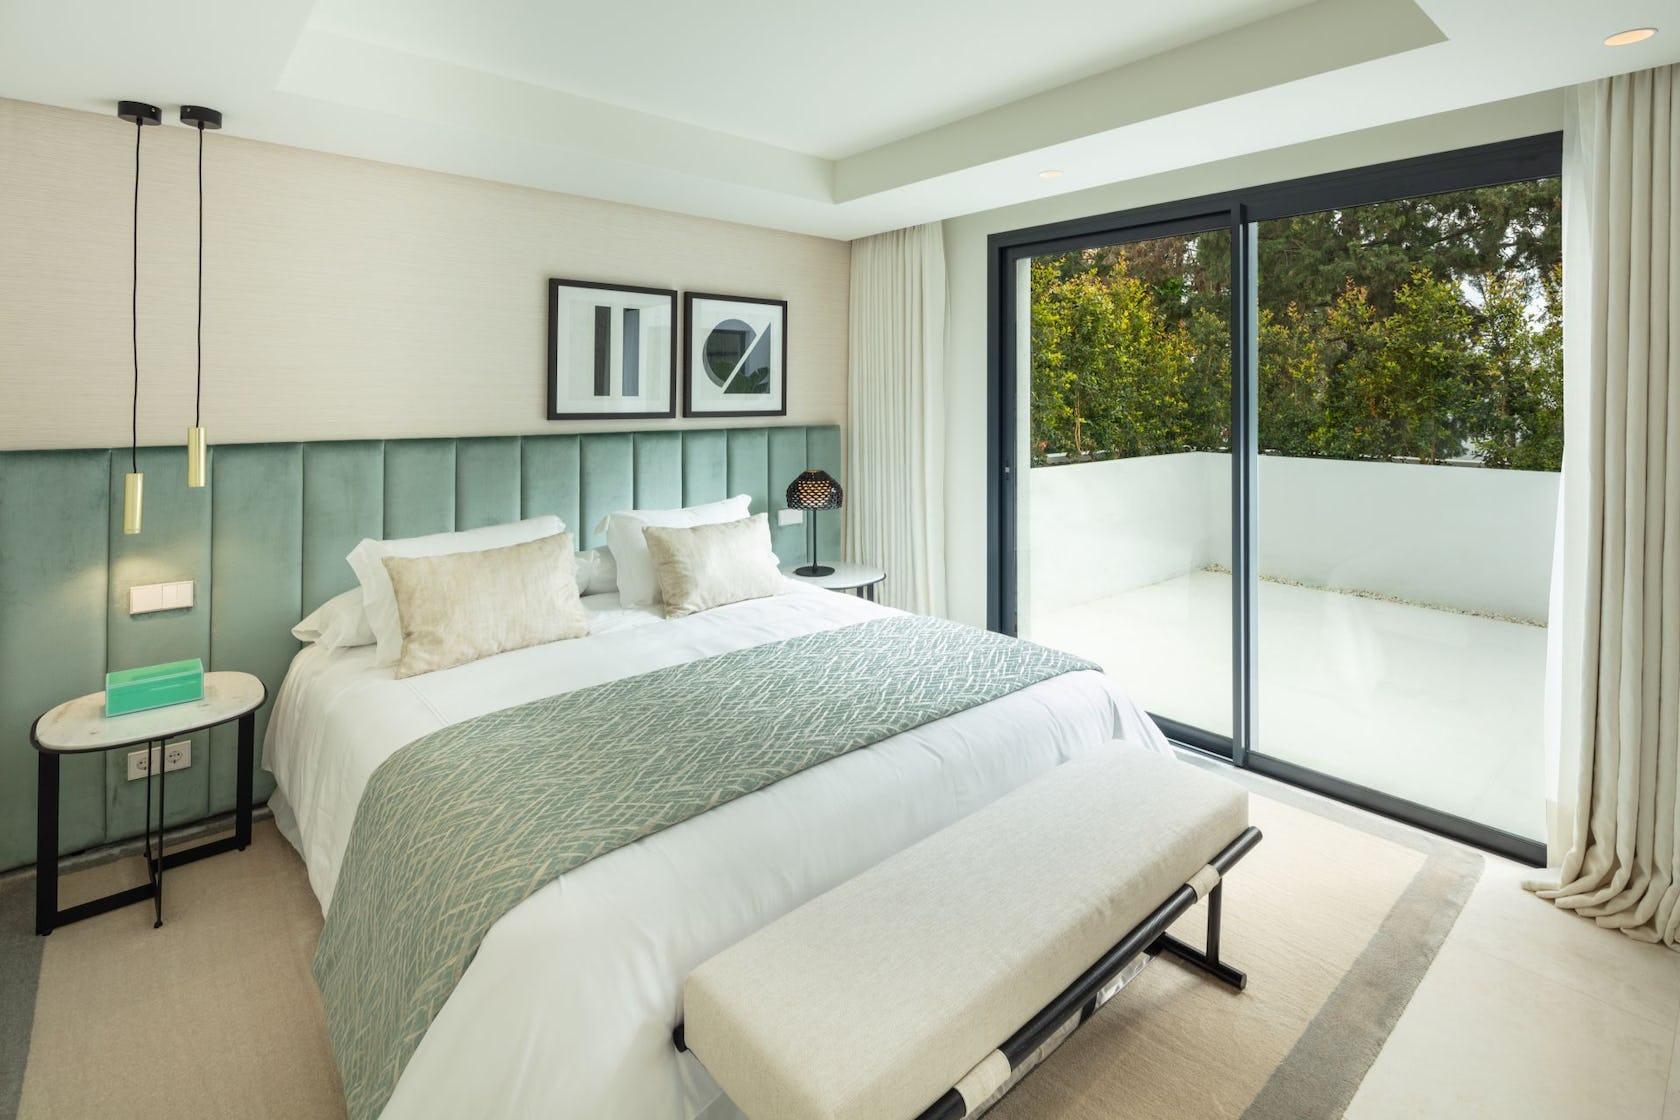 bed furniture interior design indoors bedroom room housing building lighting